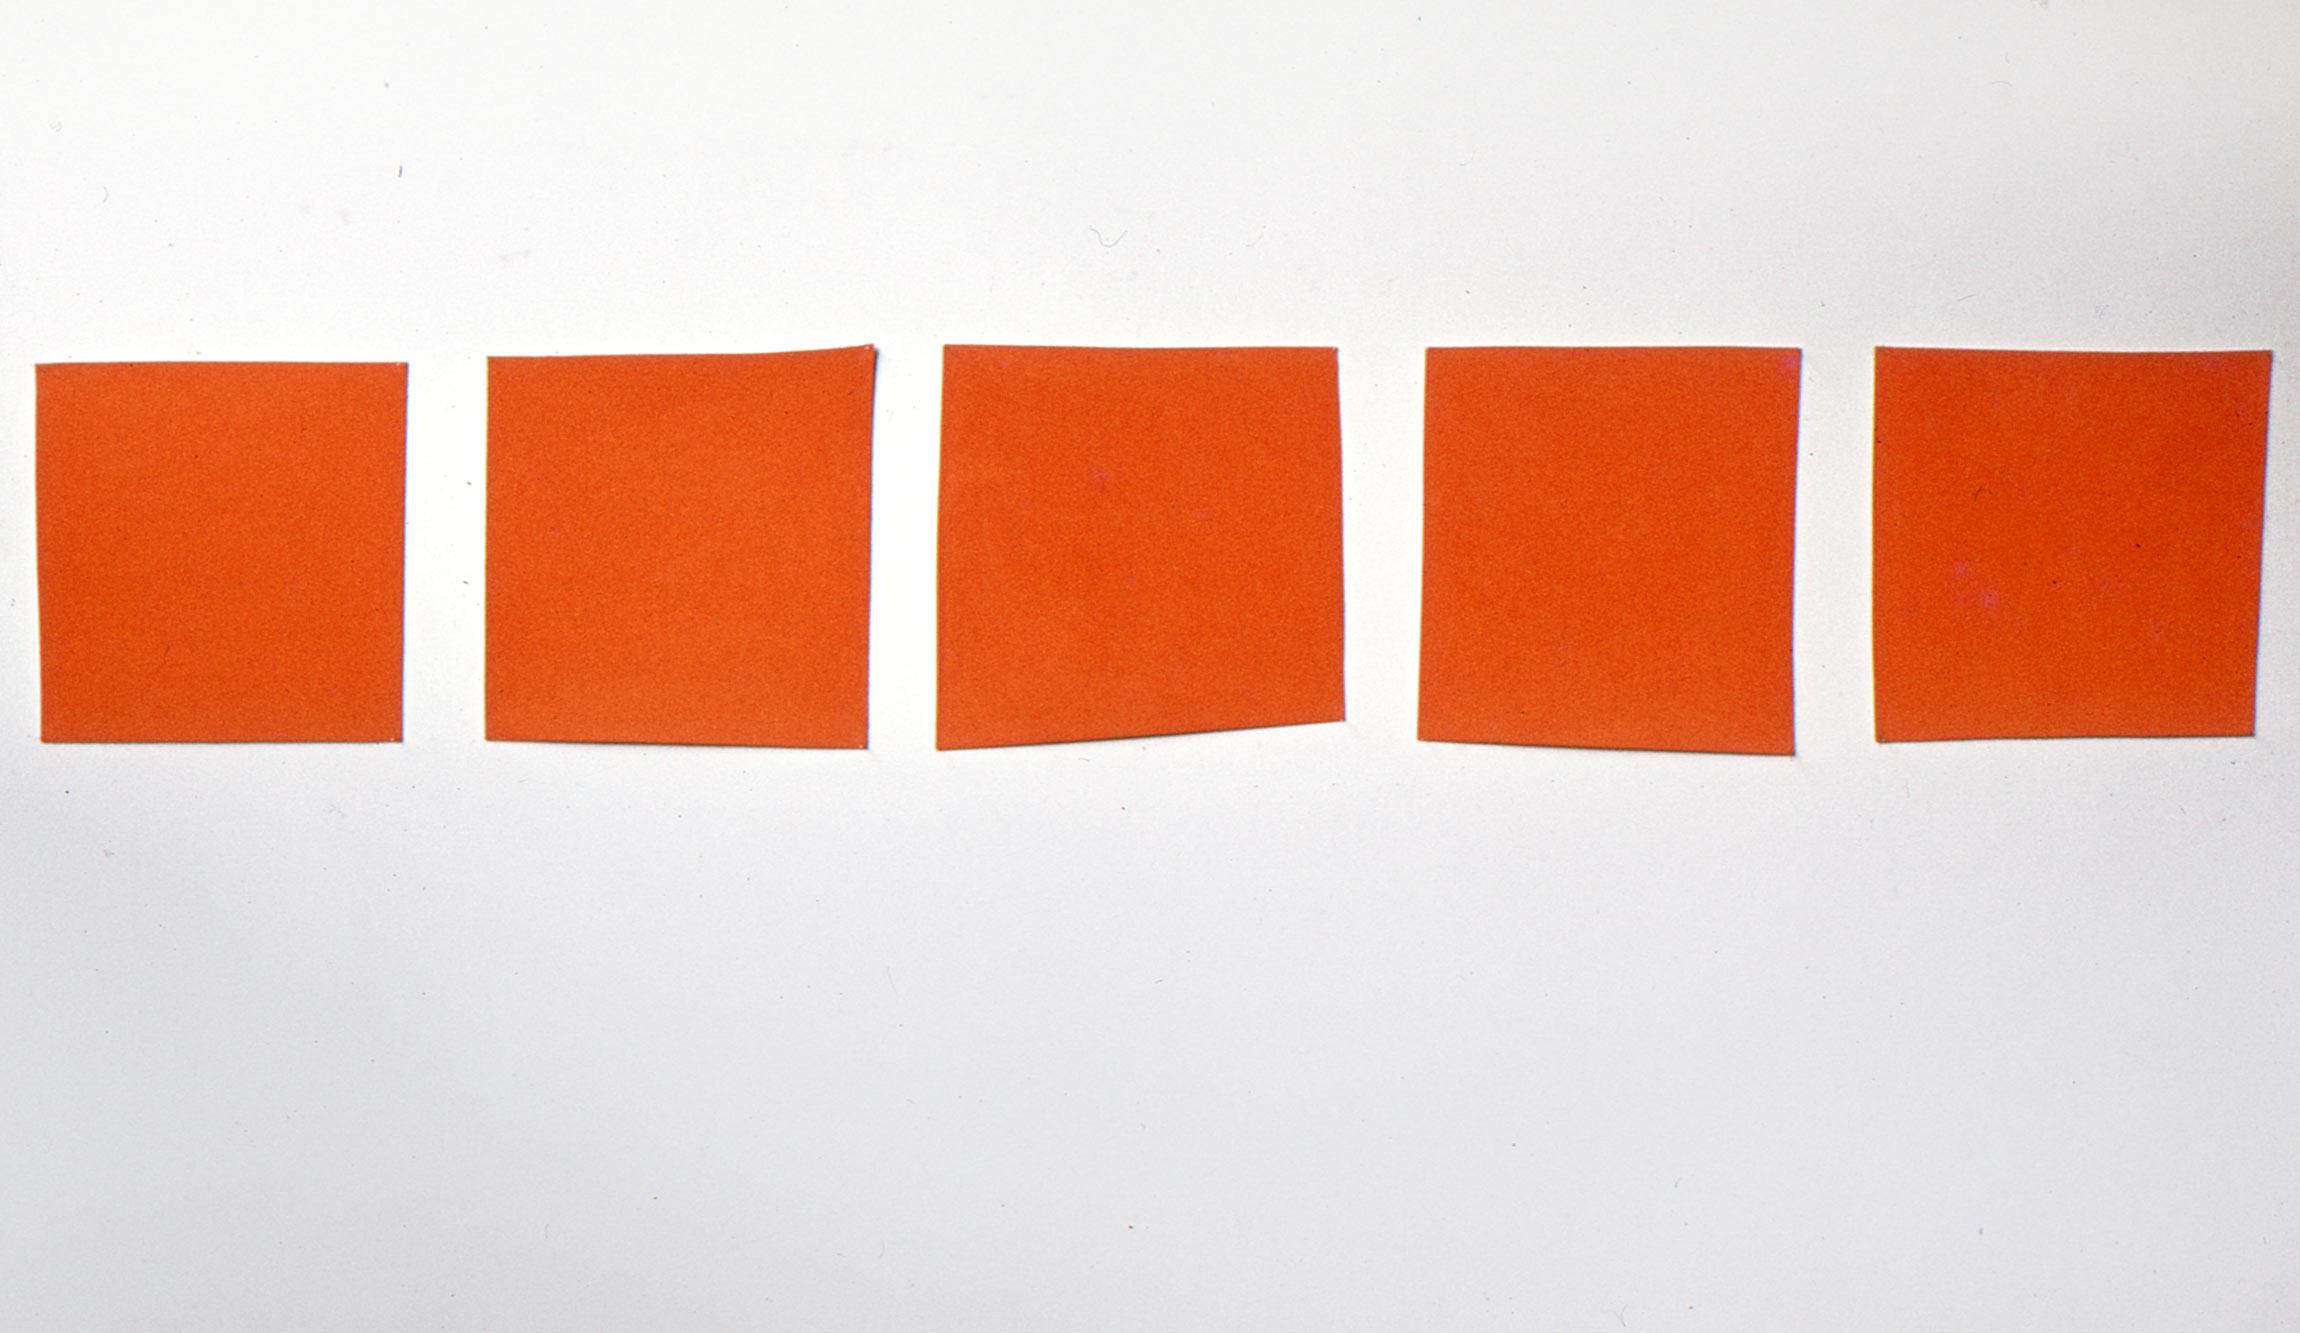 PigmentMixed-4mg001017_ws.jpg